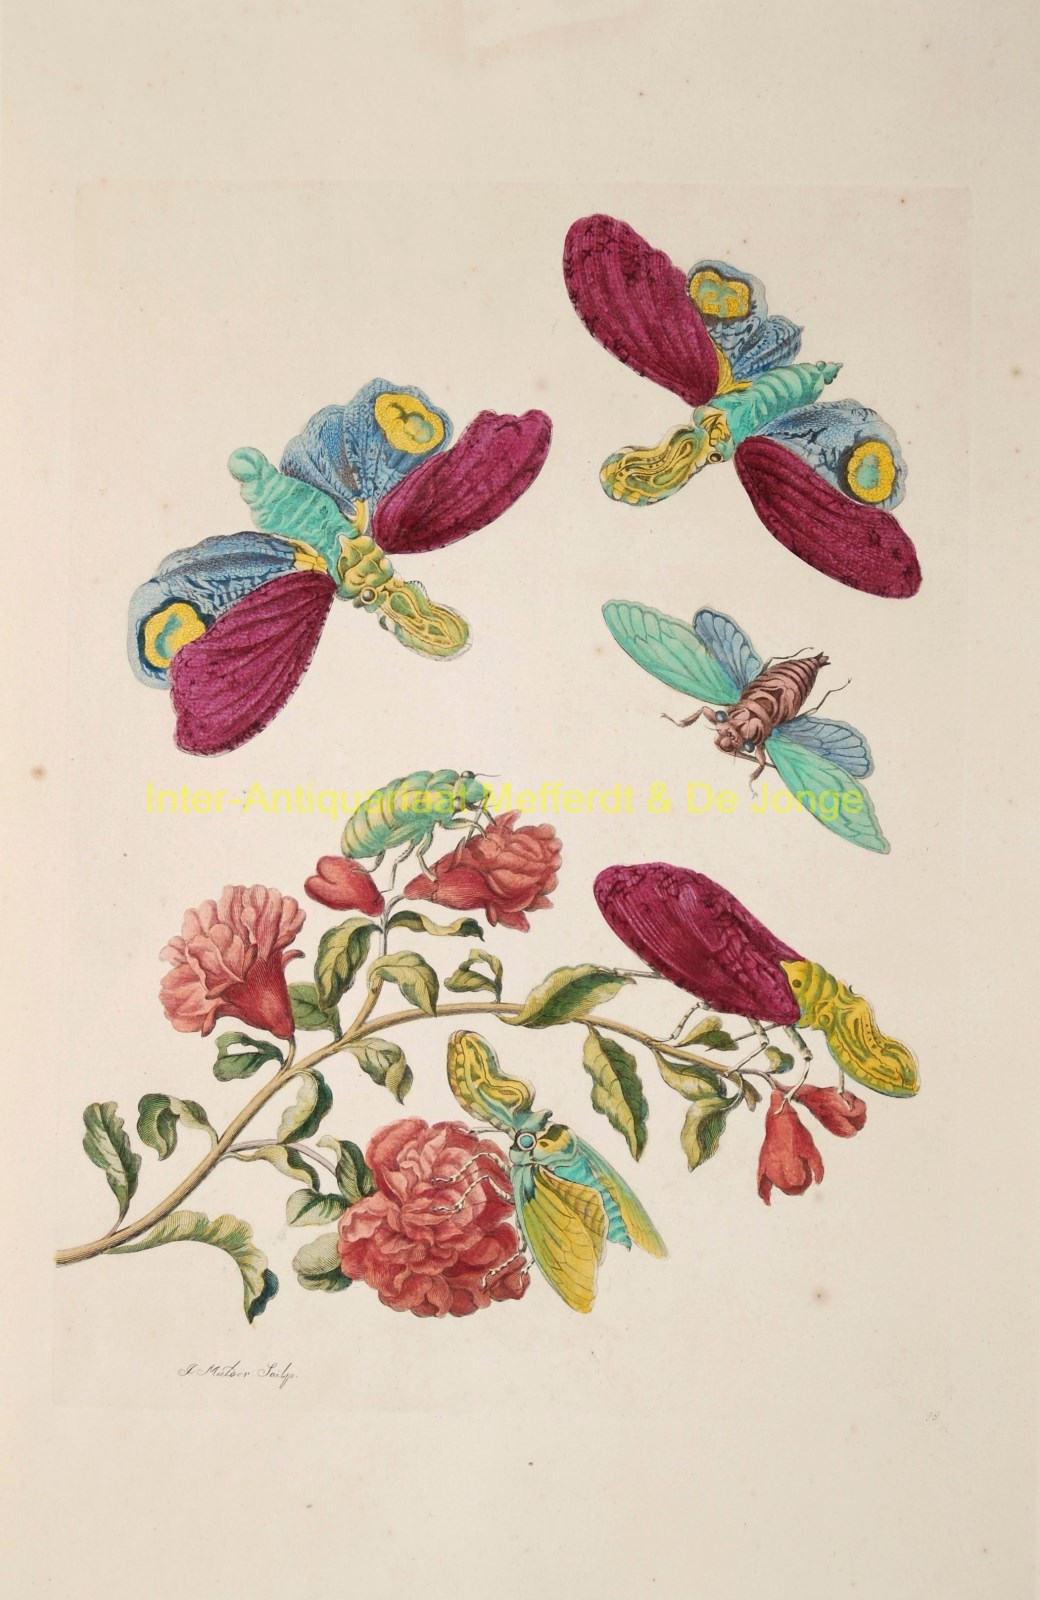 MERIAN,  MARIA SIBYLLA - Maria Sibylla Merian - Granaatappel bloesem, pomegranate flower